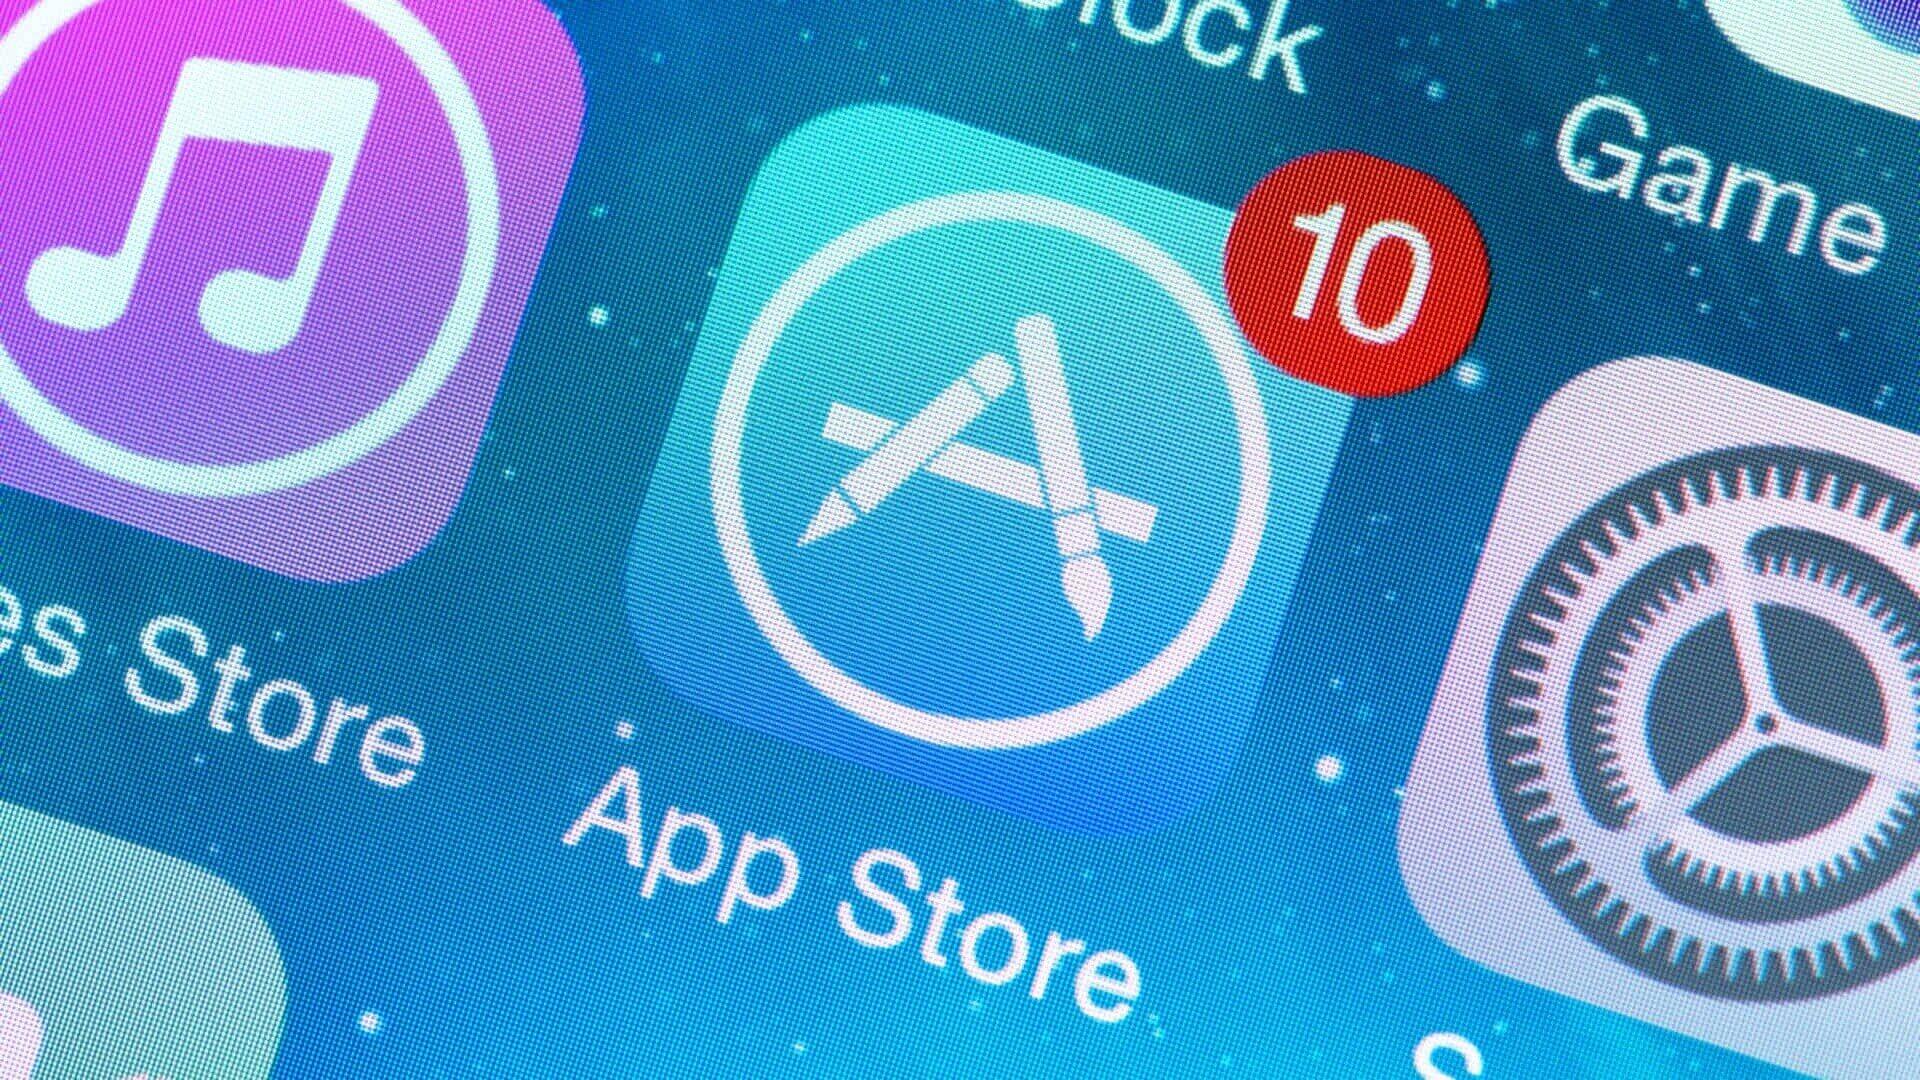 App store main